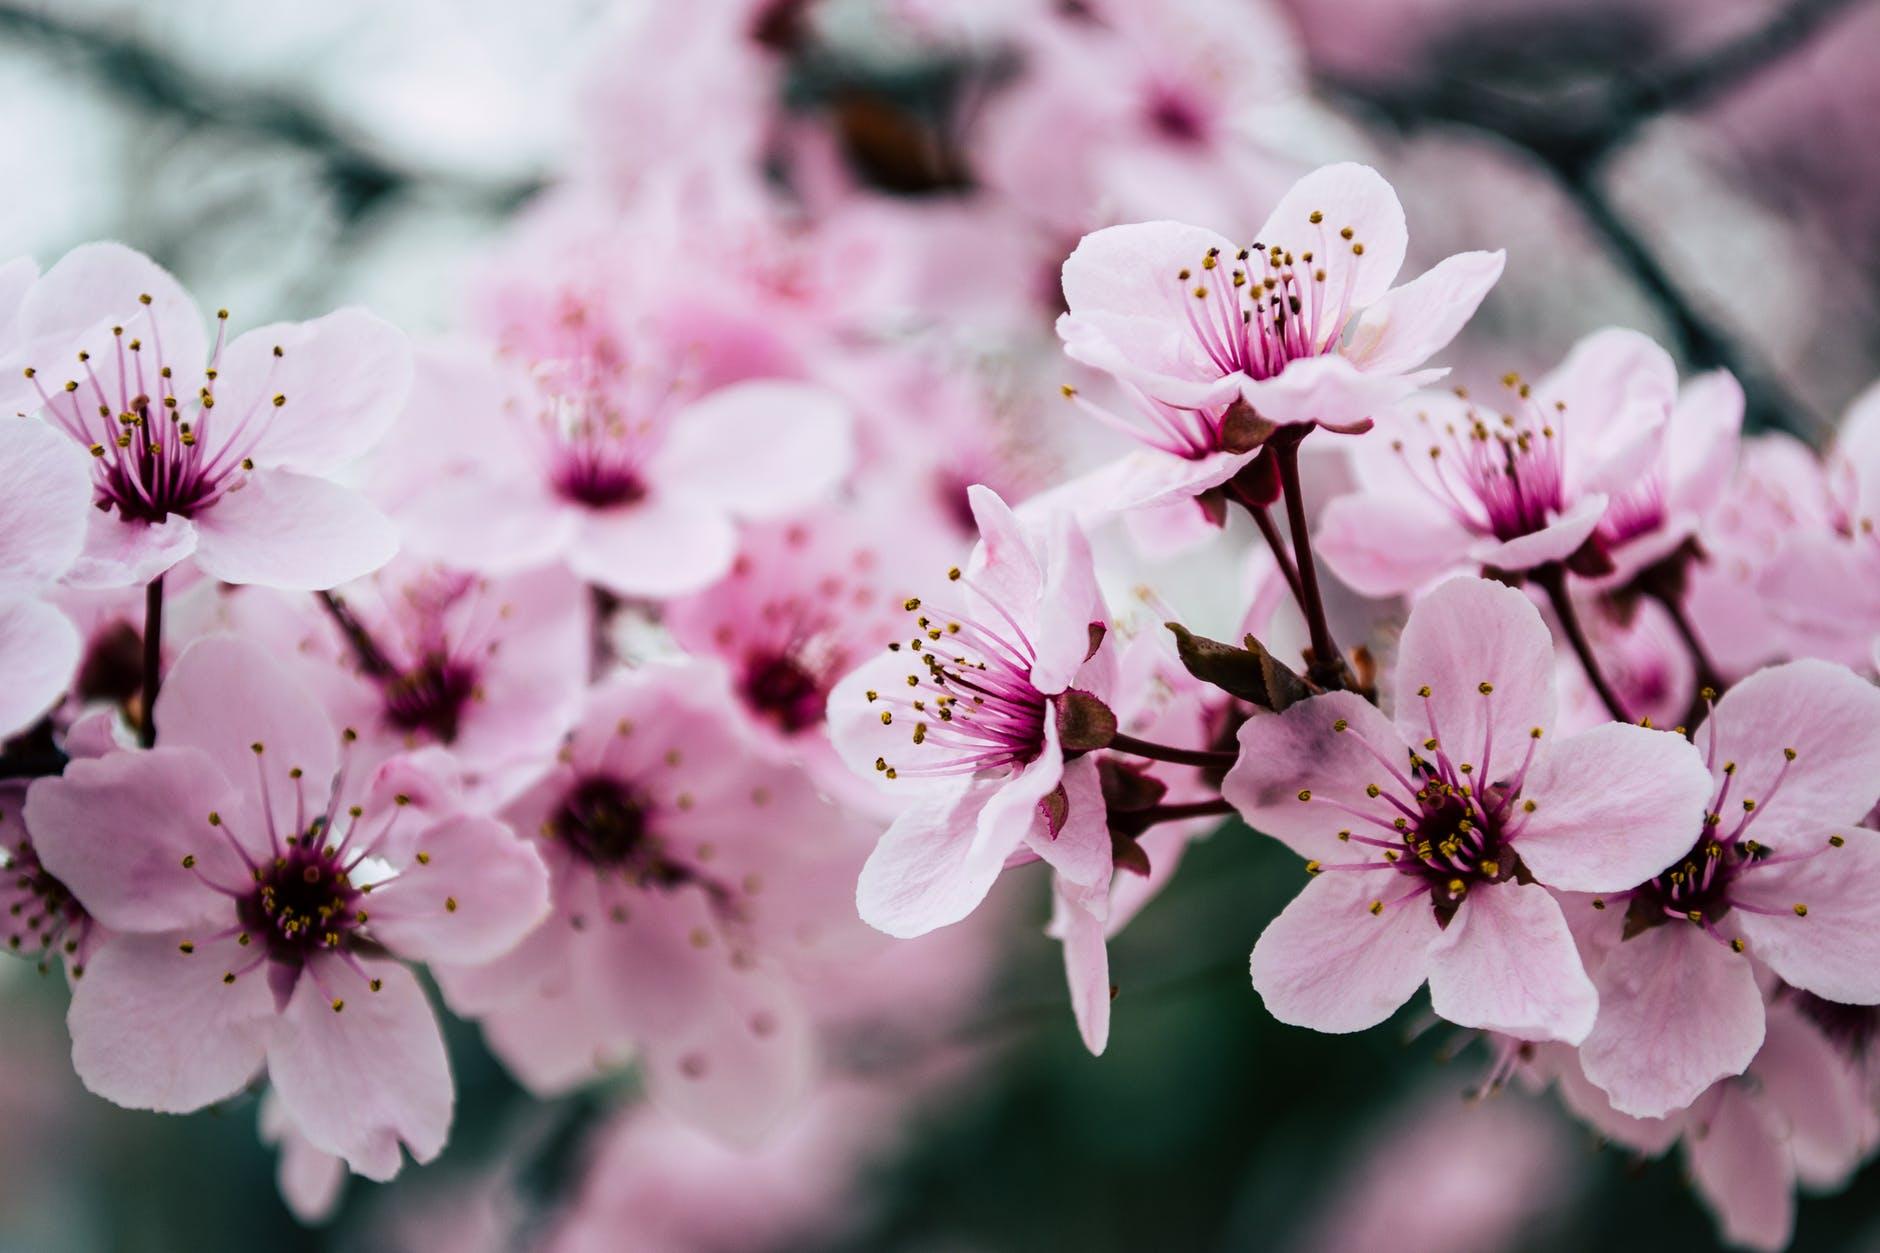 pink petaled flowers closeup photo